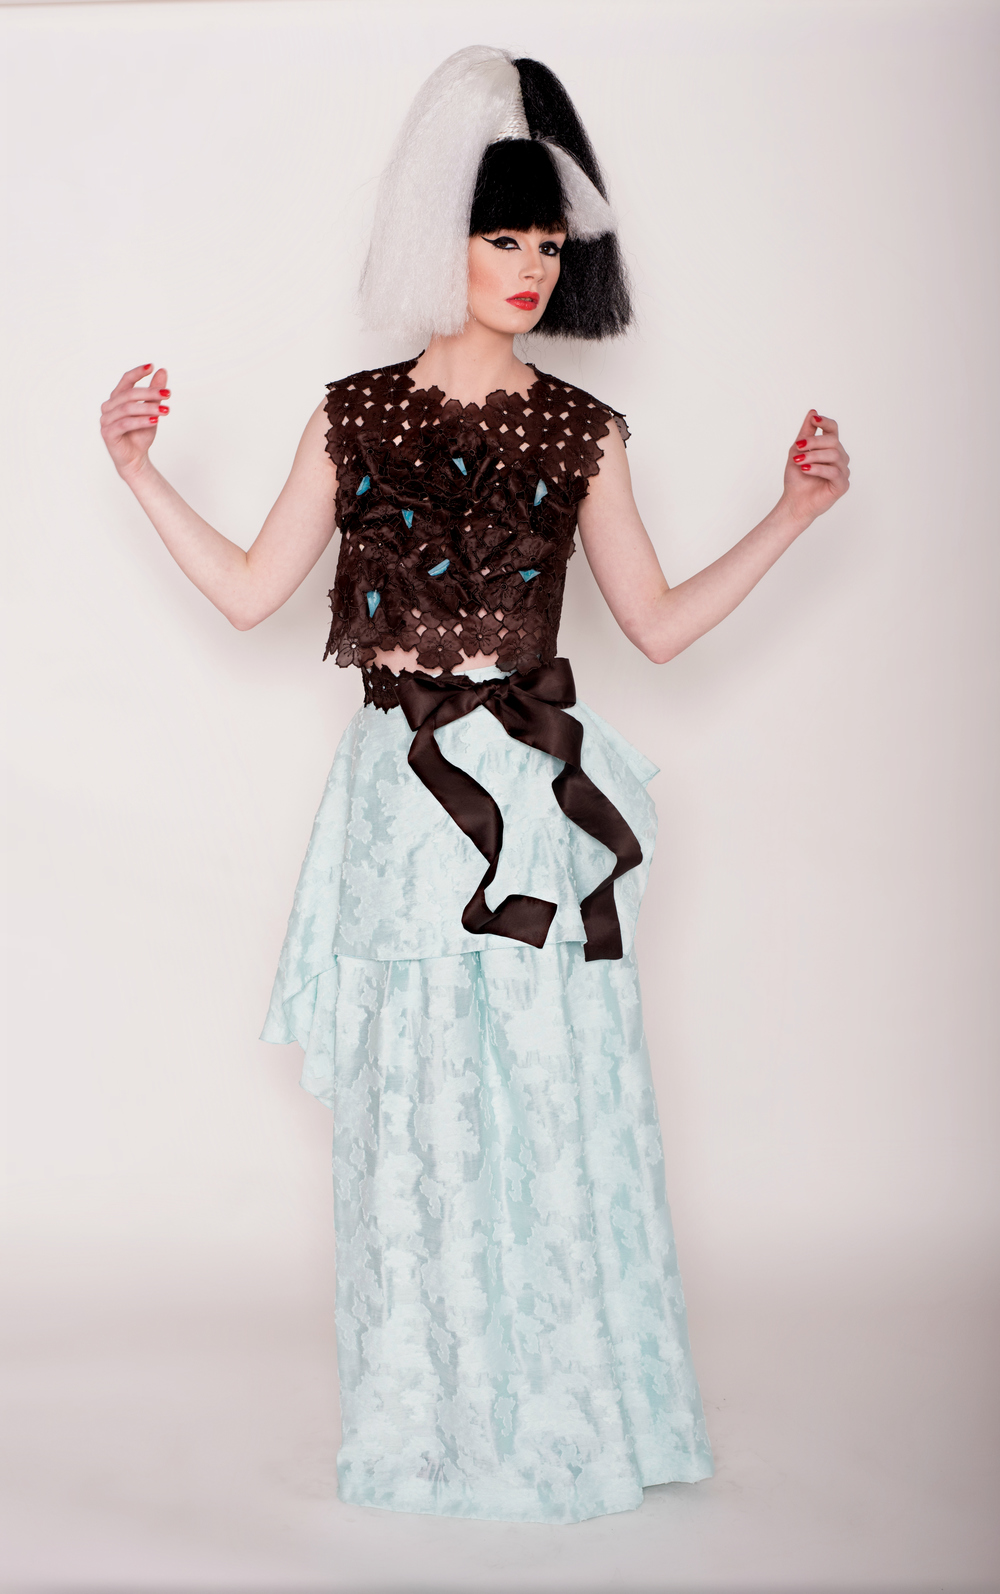 nine-gleyzer-designer-dress-4.jpg